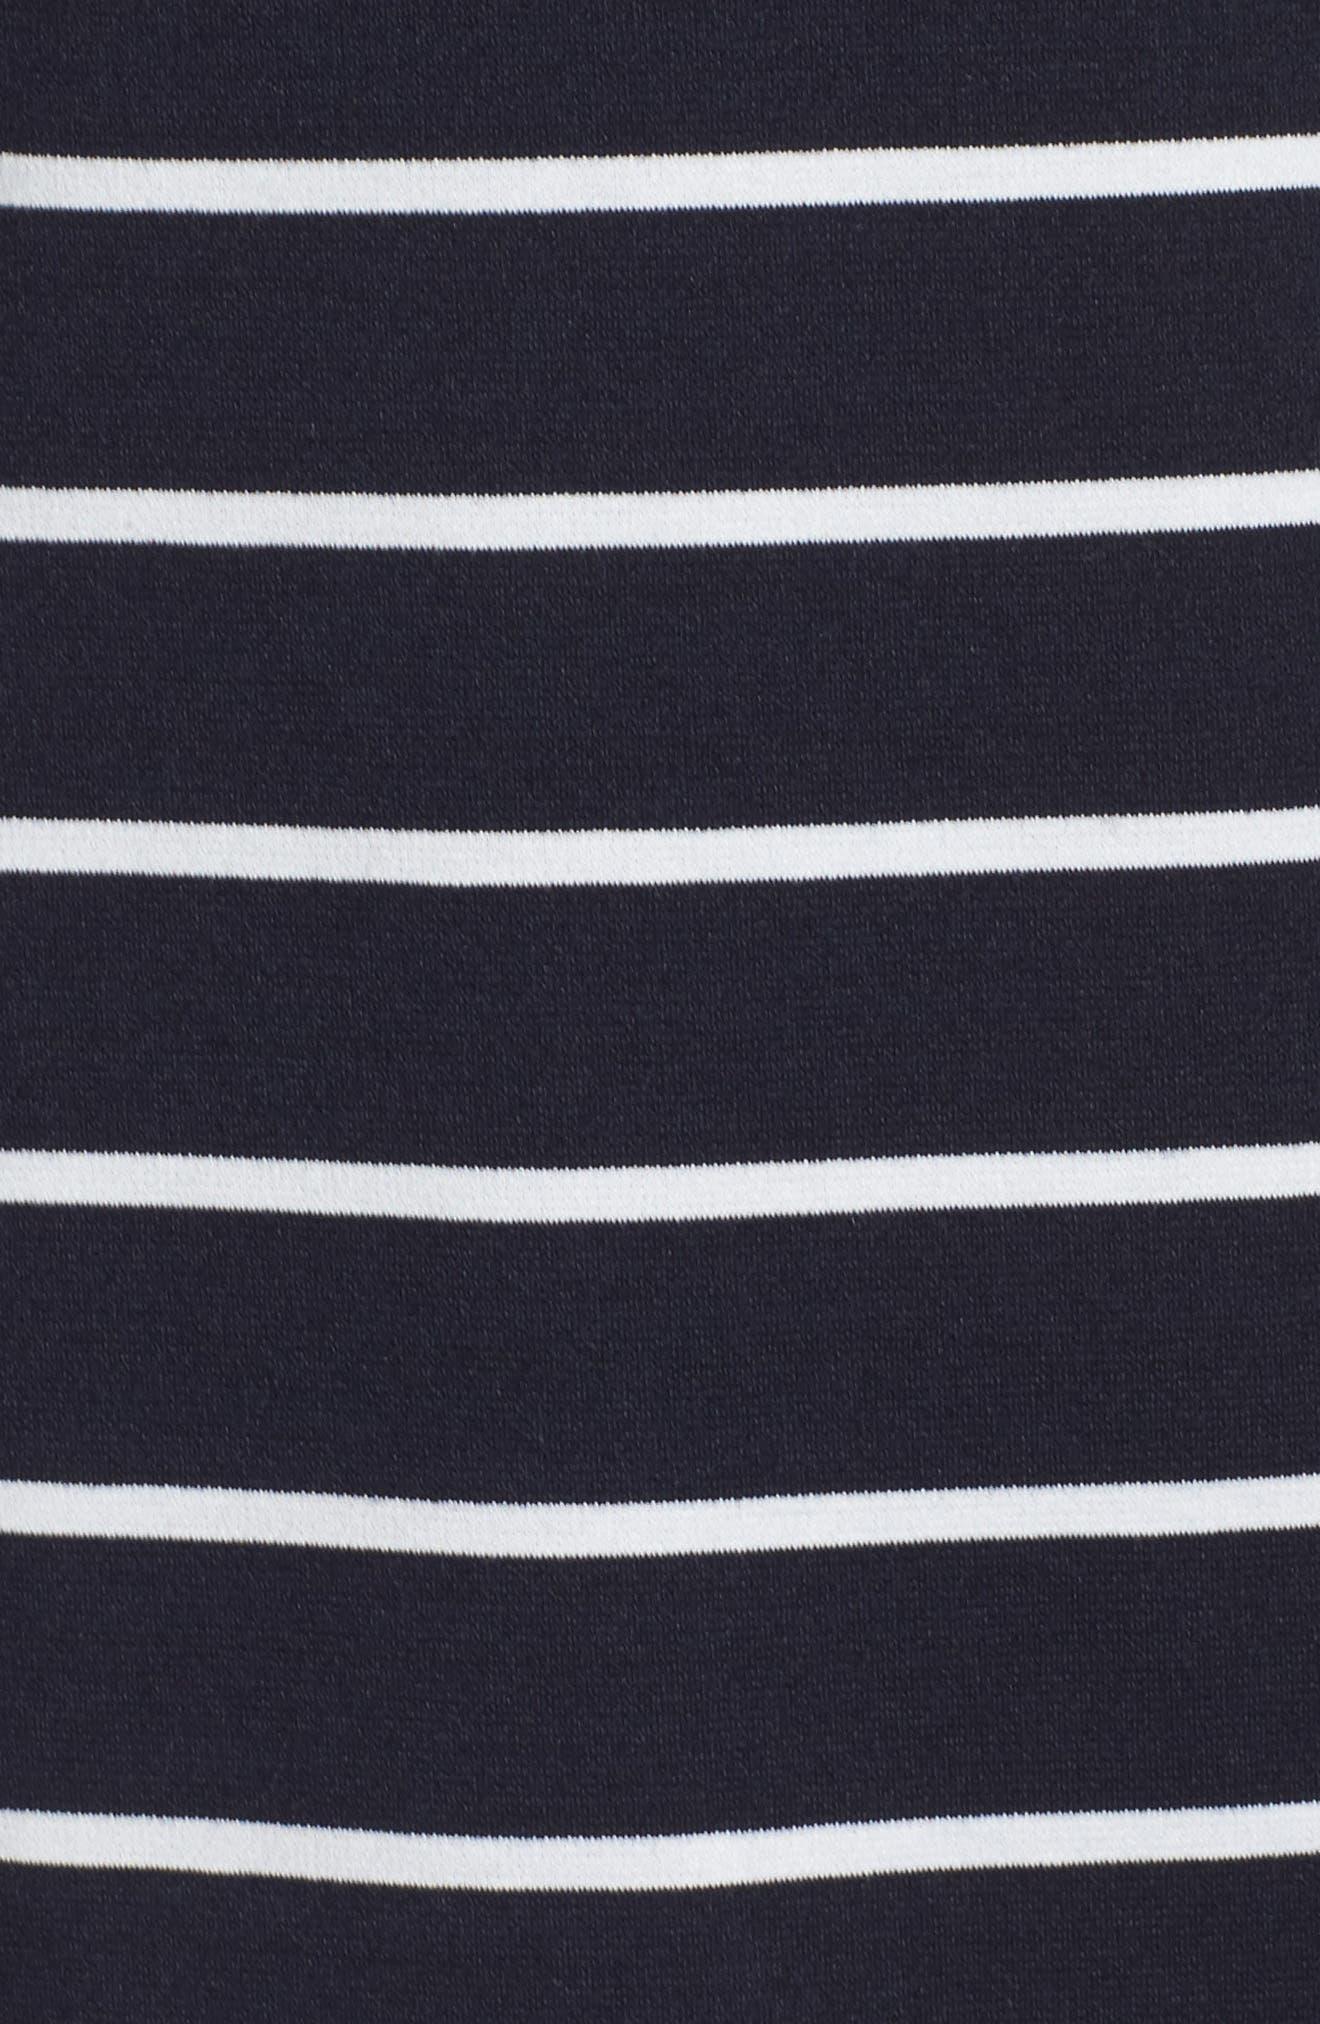 Mandarin Collar Shift Dress,                             Alternate thumbnail 5, color,                             Navy/ Ivory